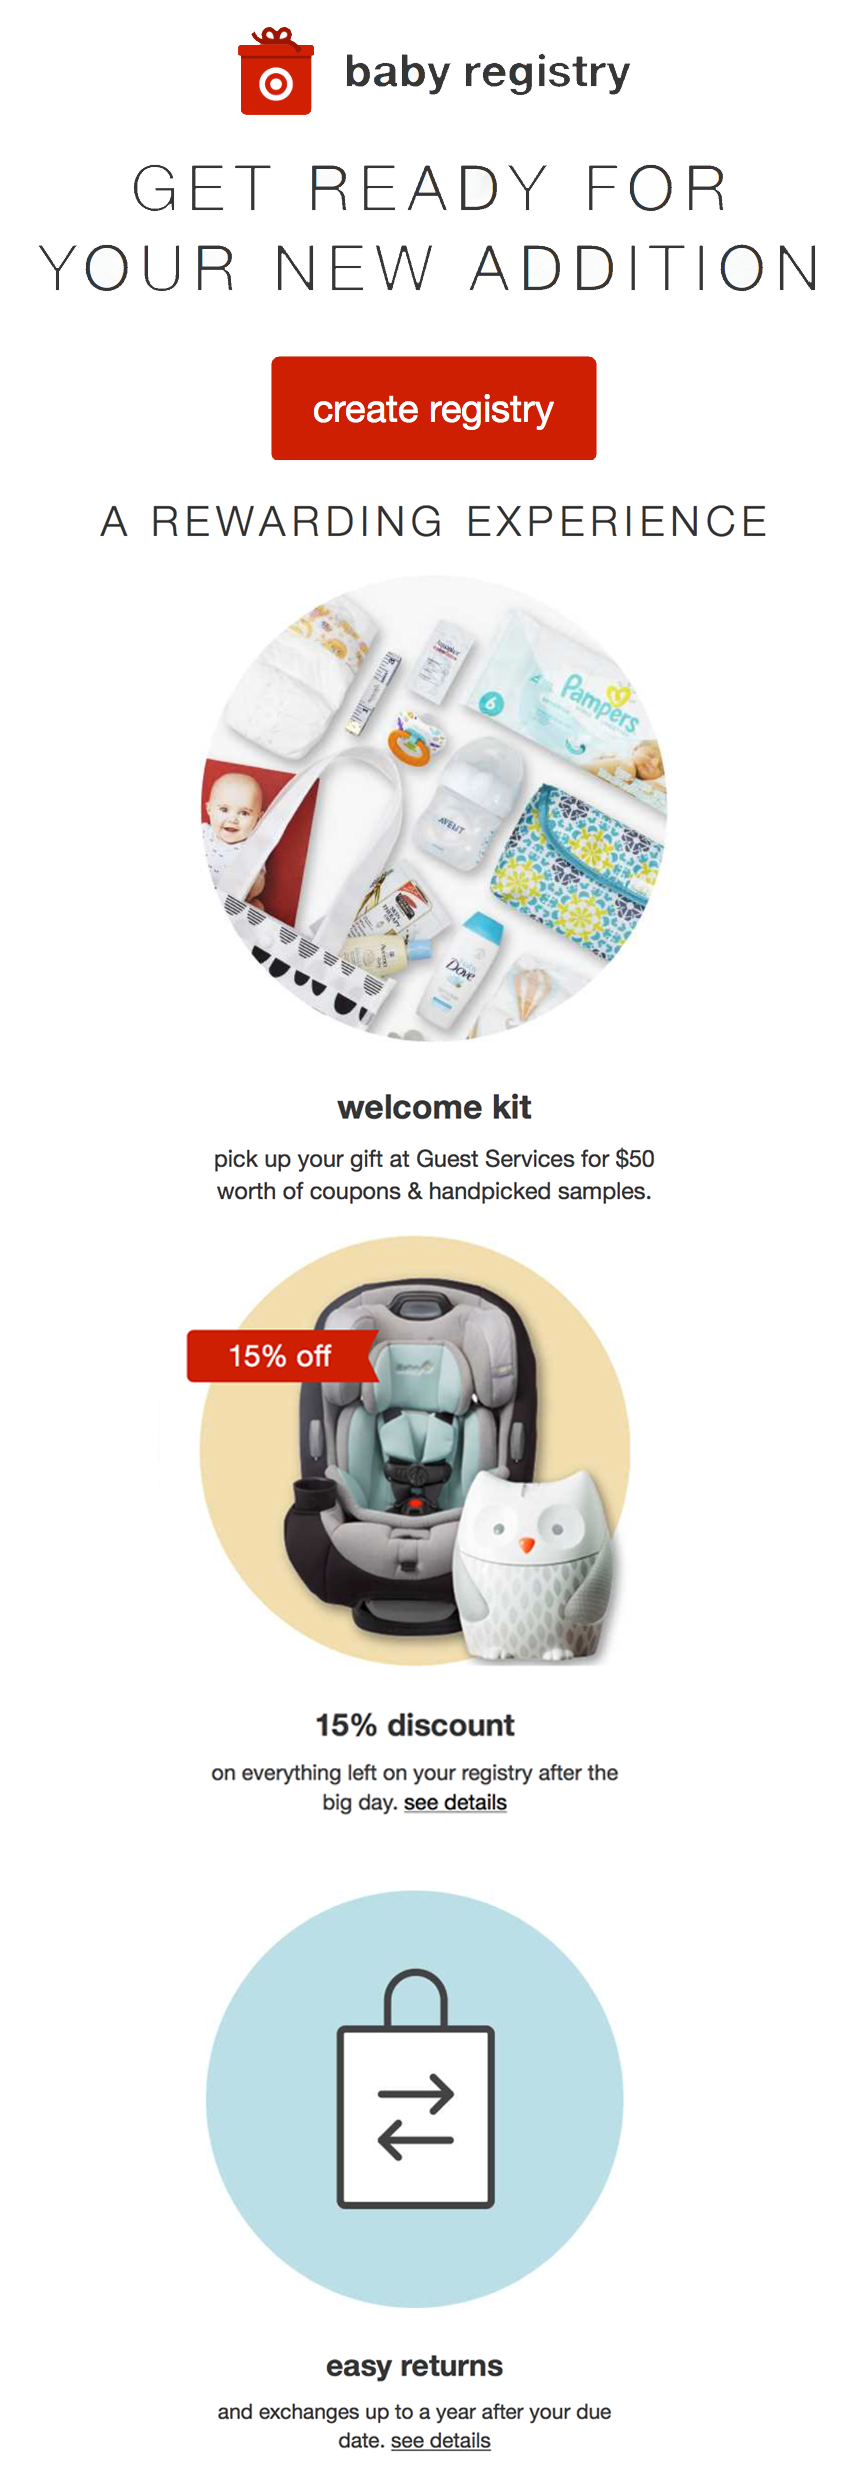 Target Baby Registry, Best baby registry, best baby shower